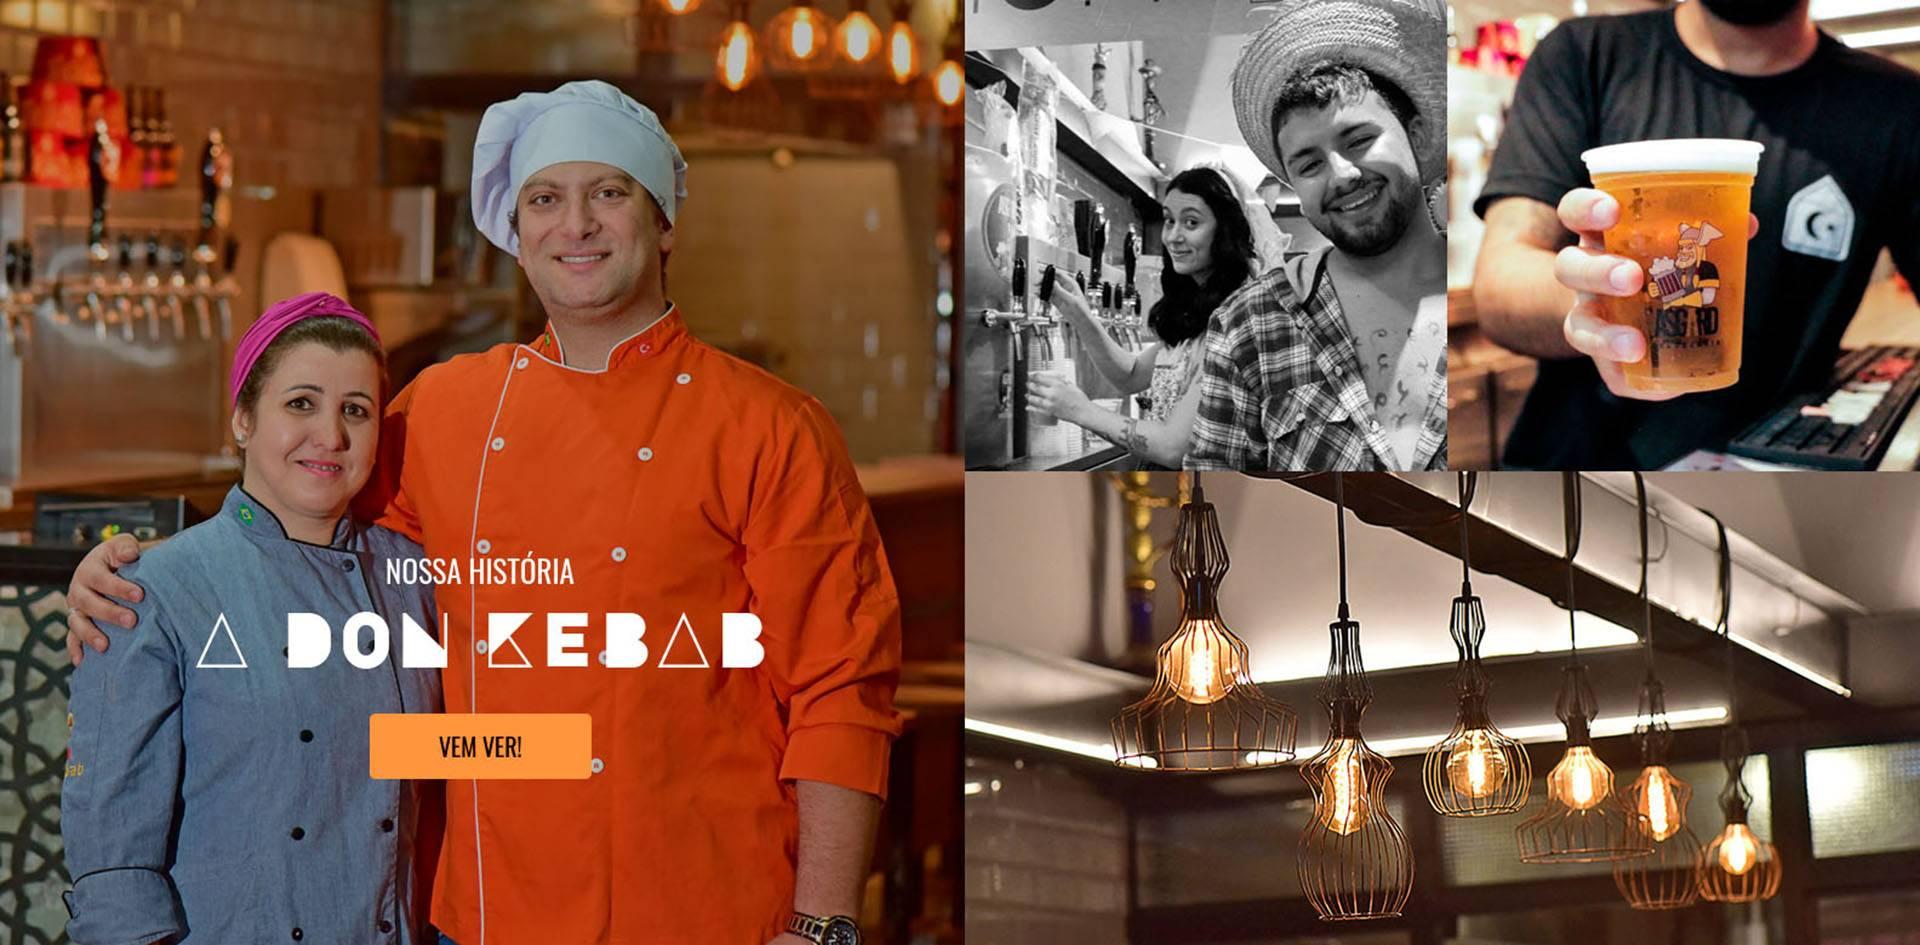 Don Kebab - O Shwarma mais clássico de Curitiba